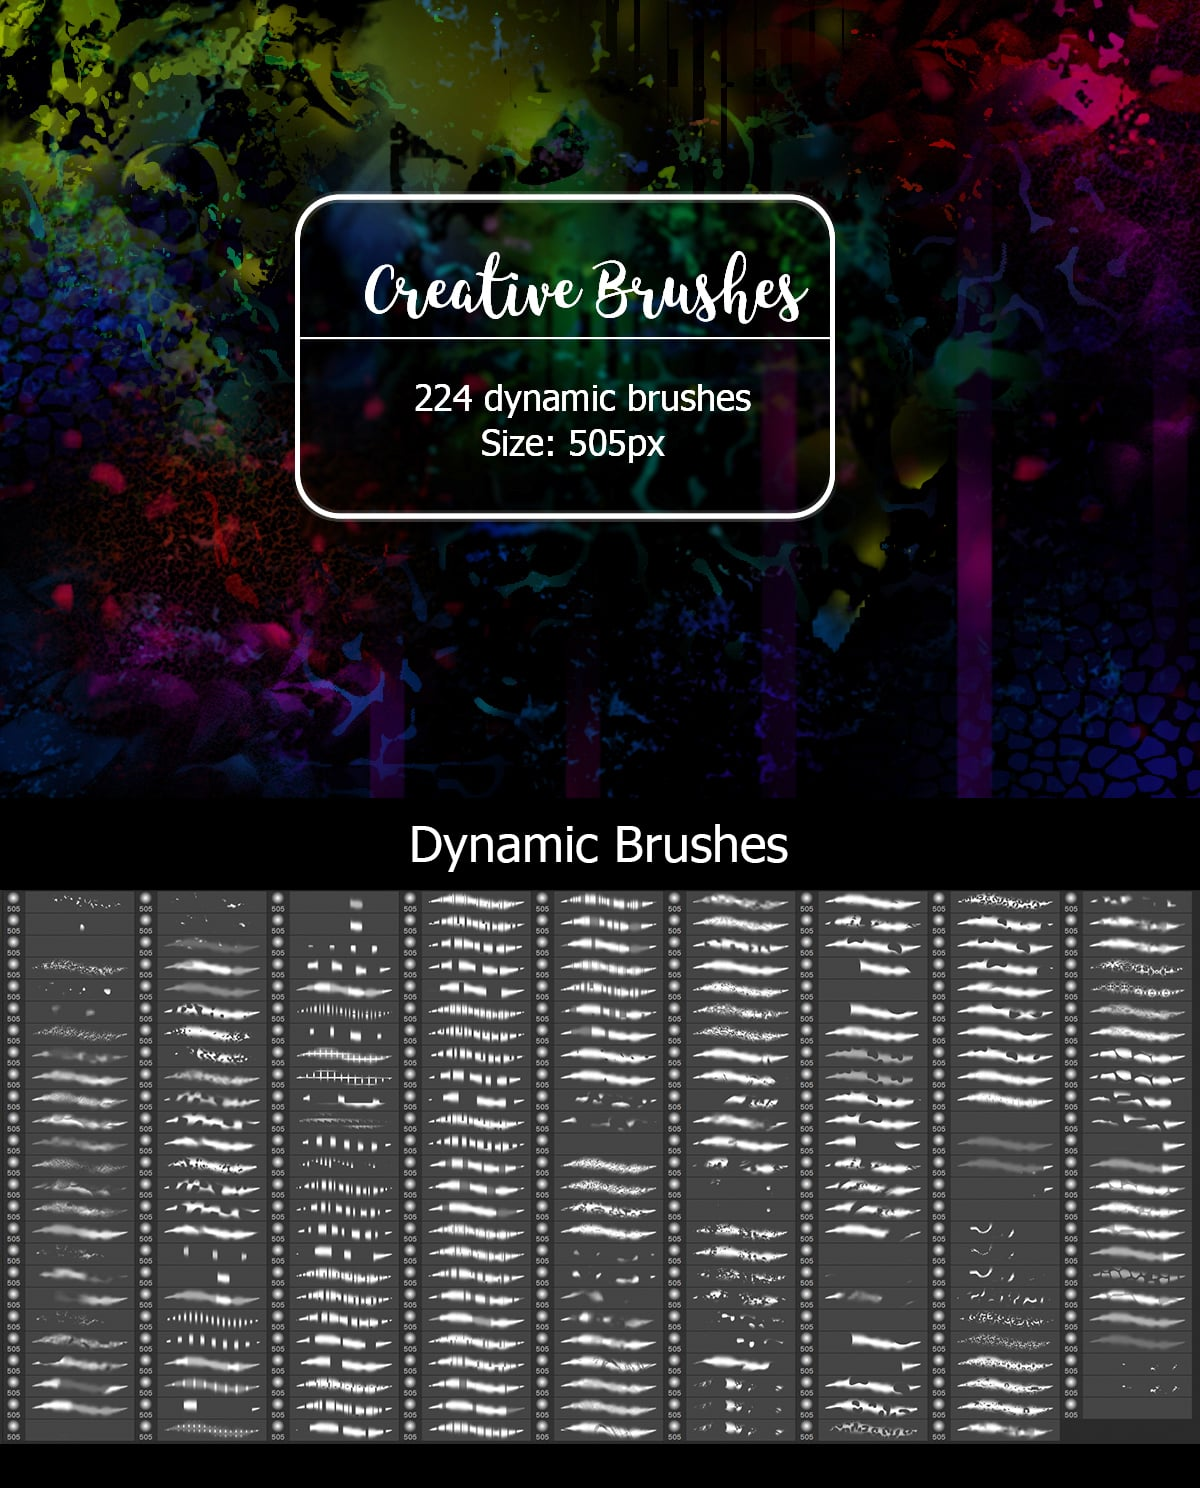 2500+ Artistic Brushes + Extra Assets - 12 Creative Brushes